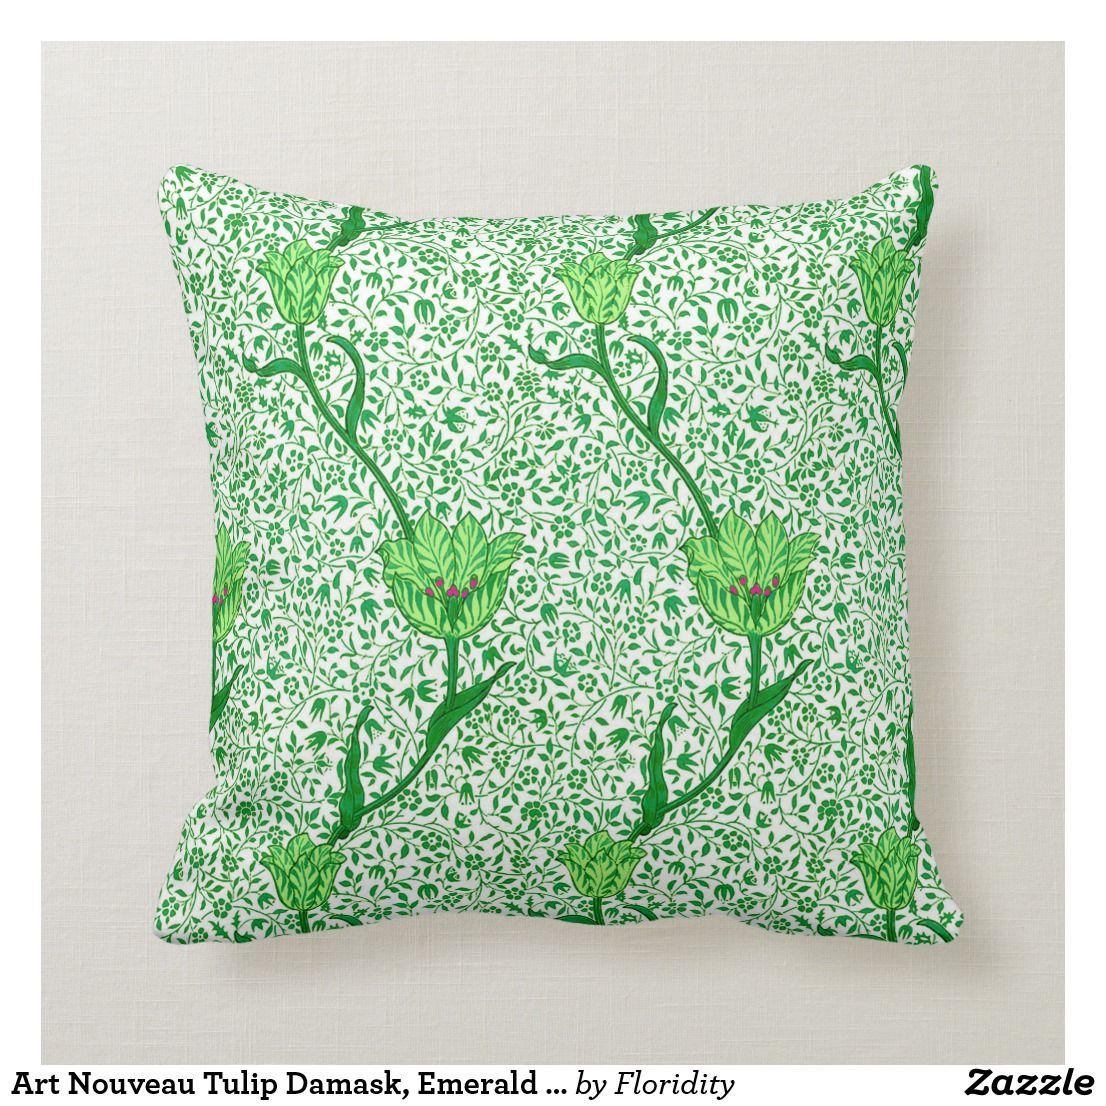 Art Nouveau Tulip Damask, Emerald Green Throw Pillow